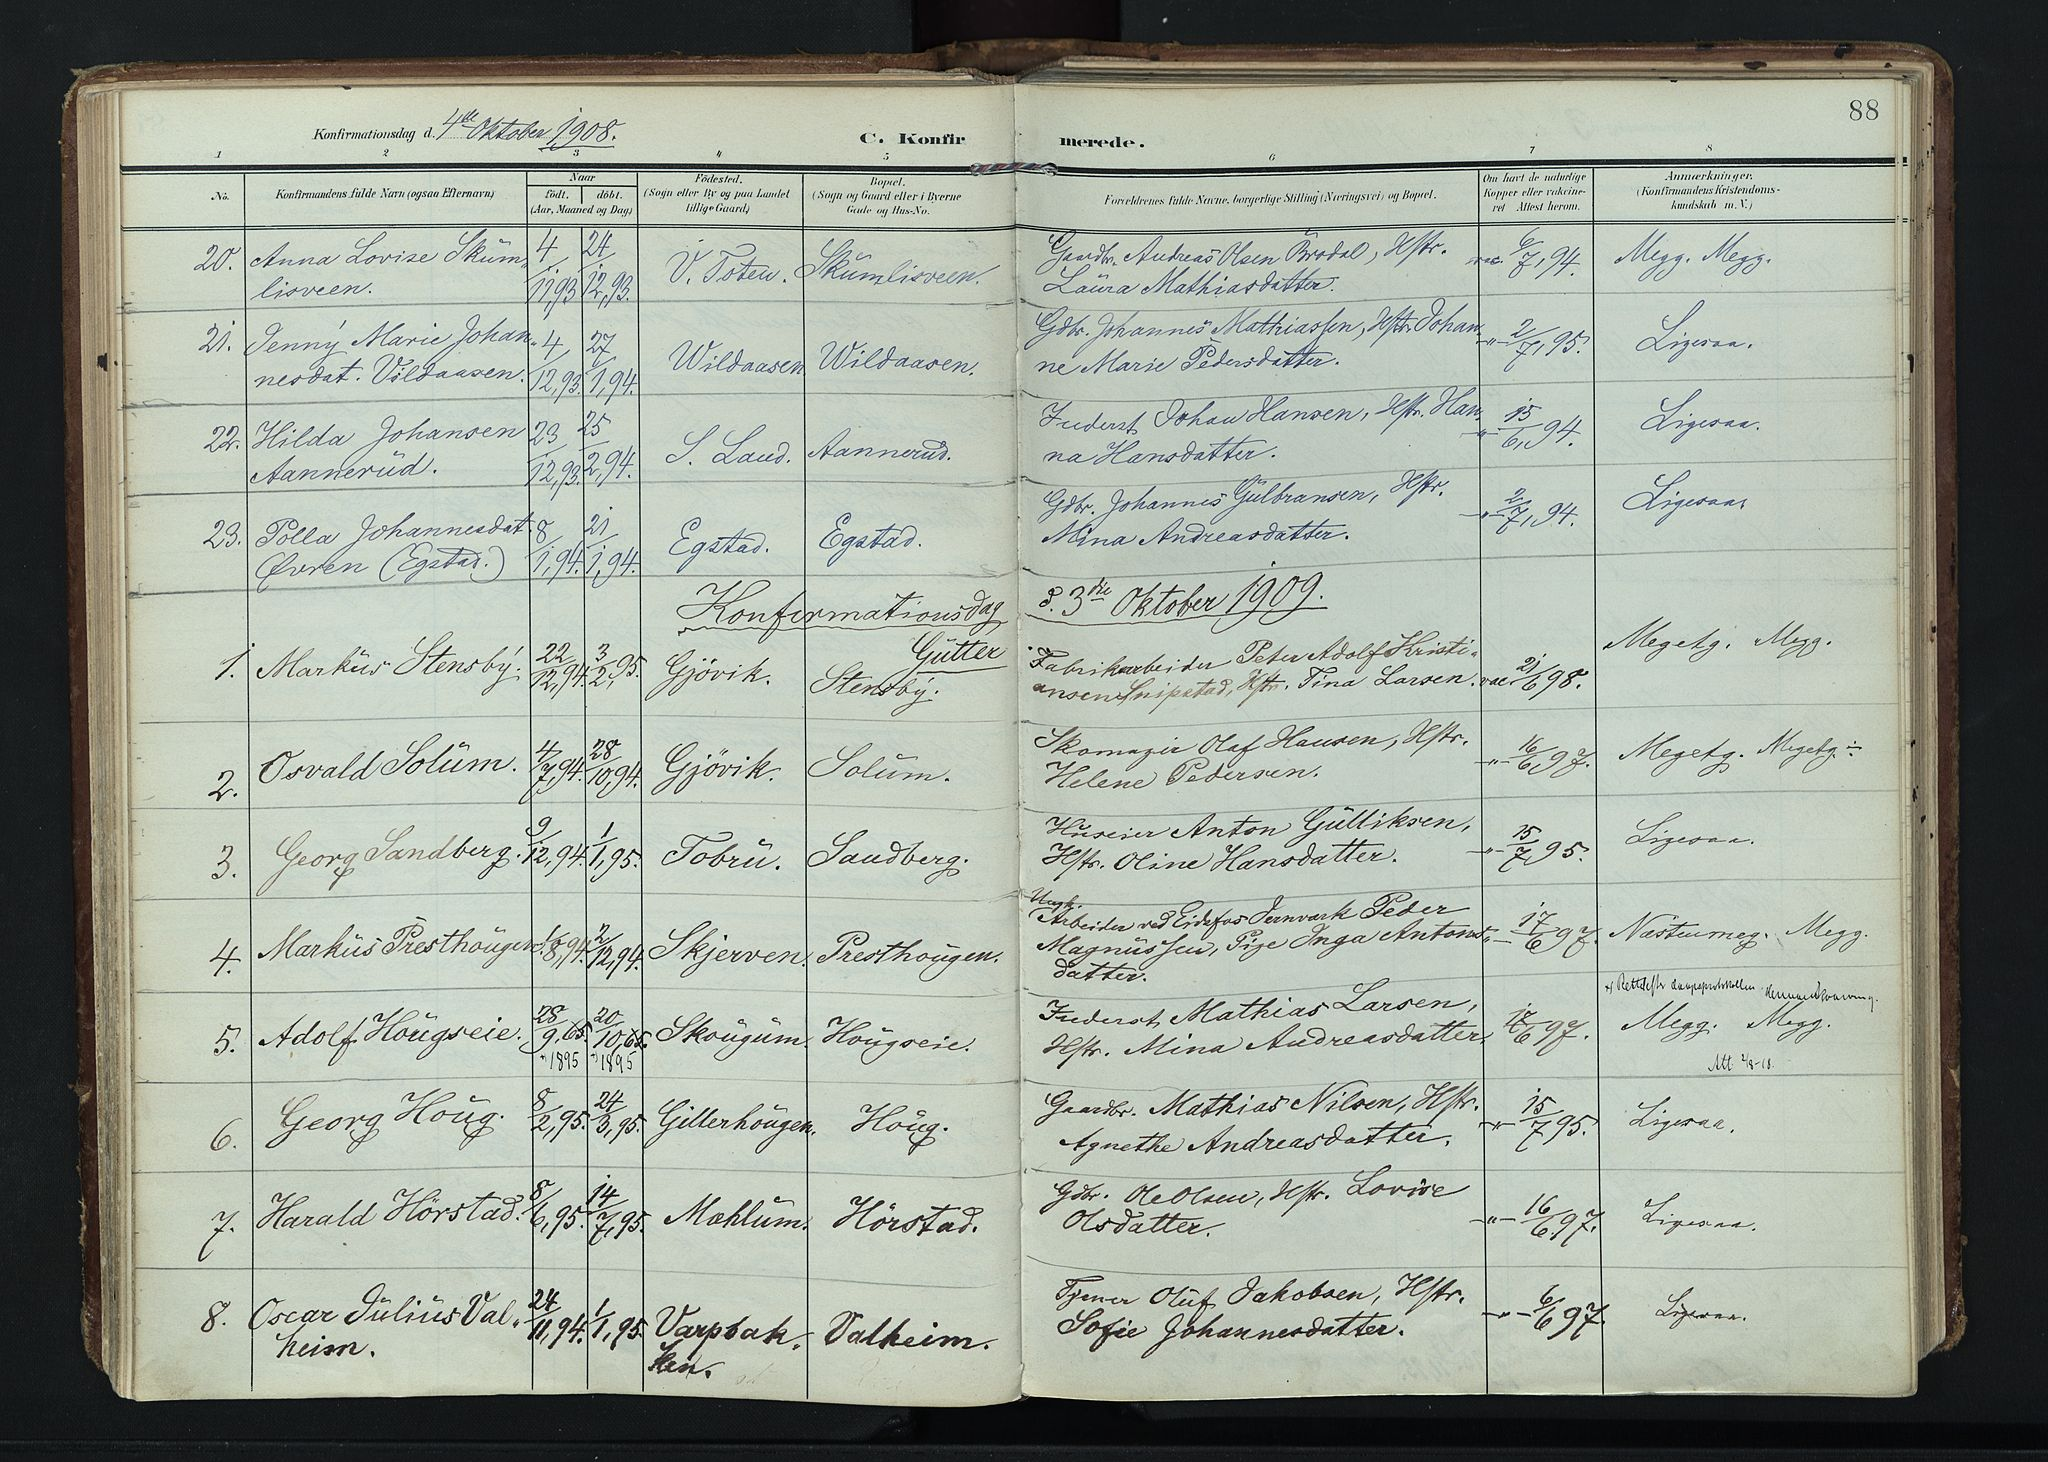 SAH, Vardal prestekontor, H/Ha/Haa/L0020: Ministerialbok nr. 20, 1907-1921, s. 88